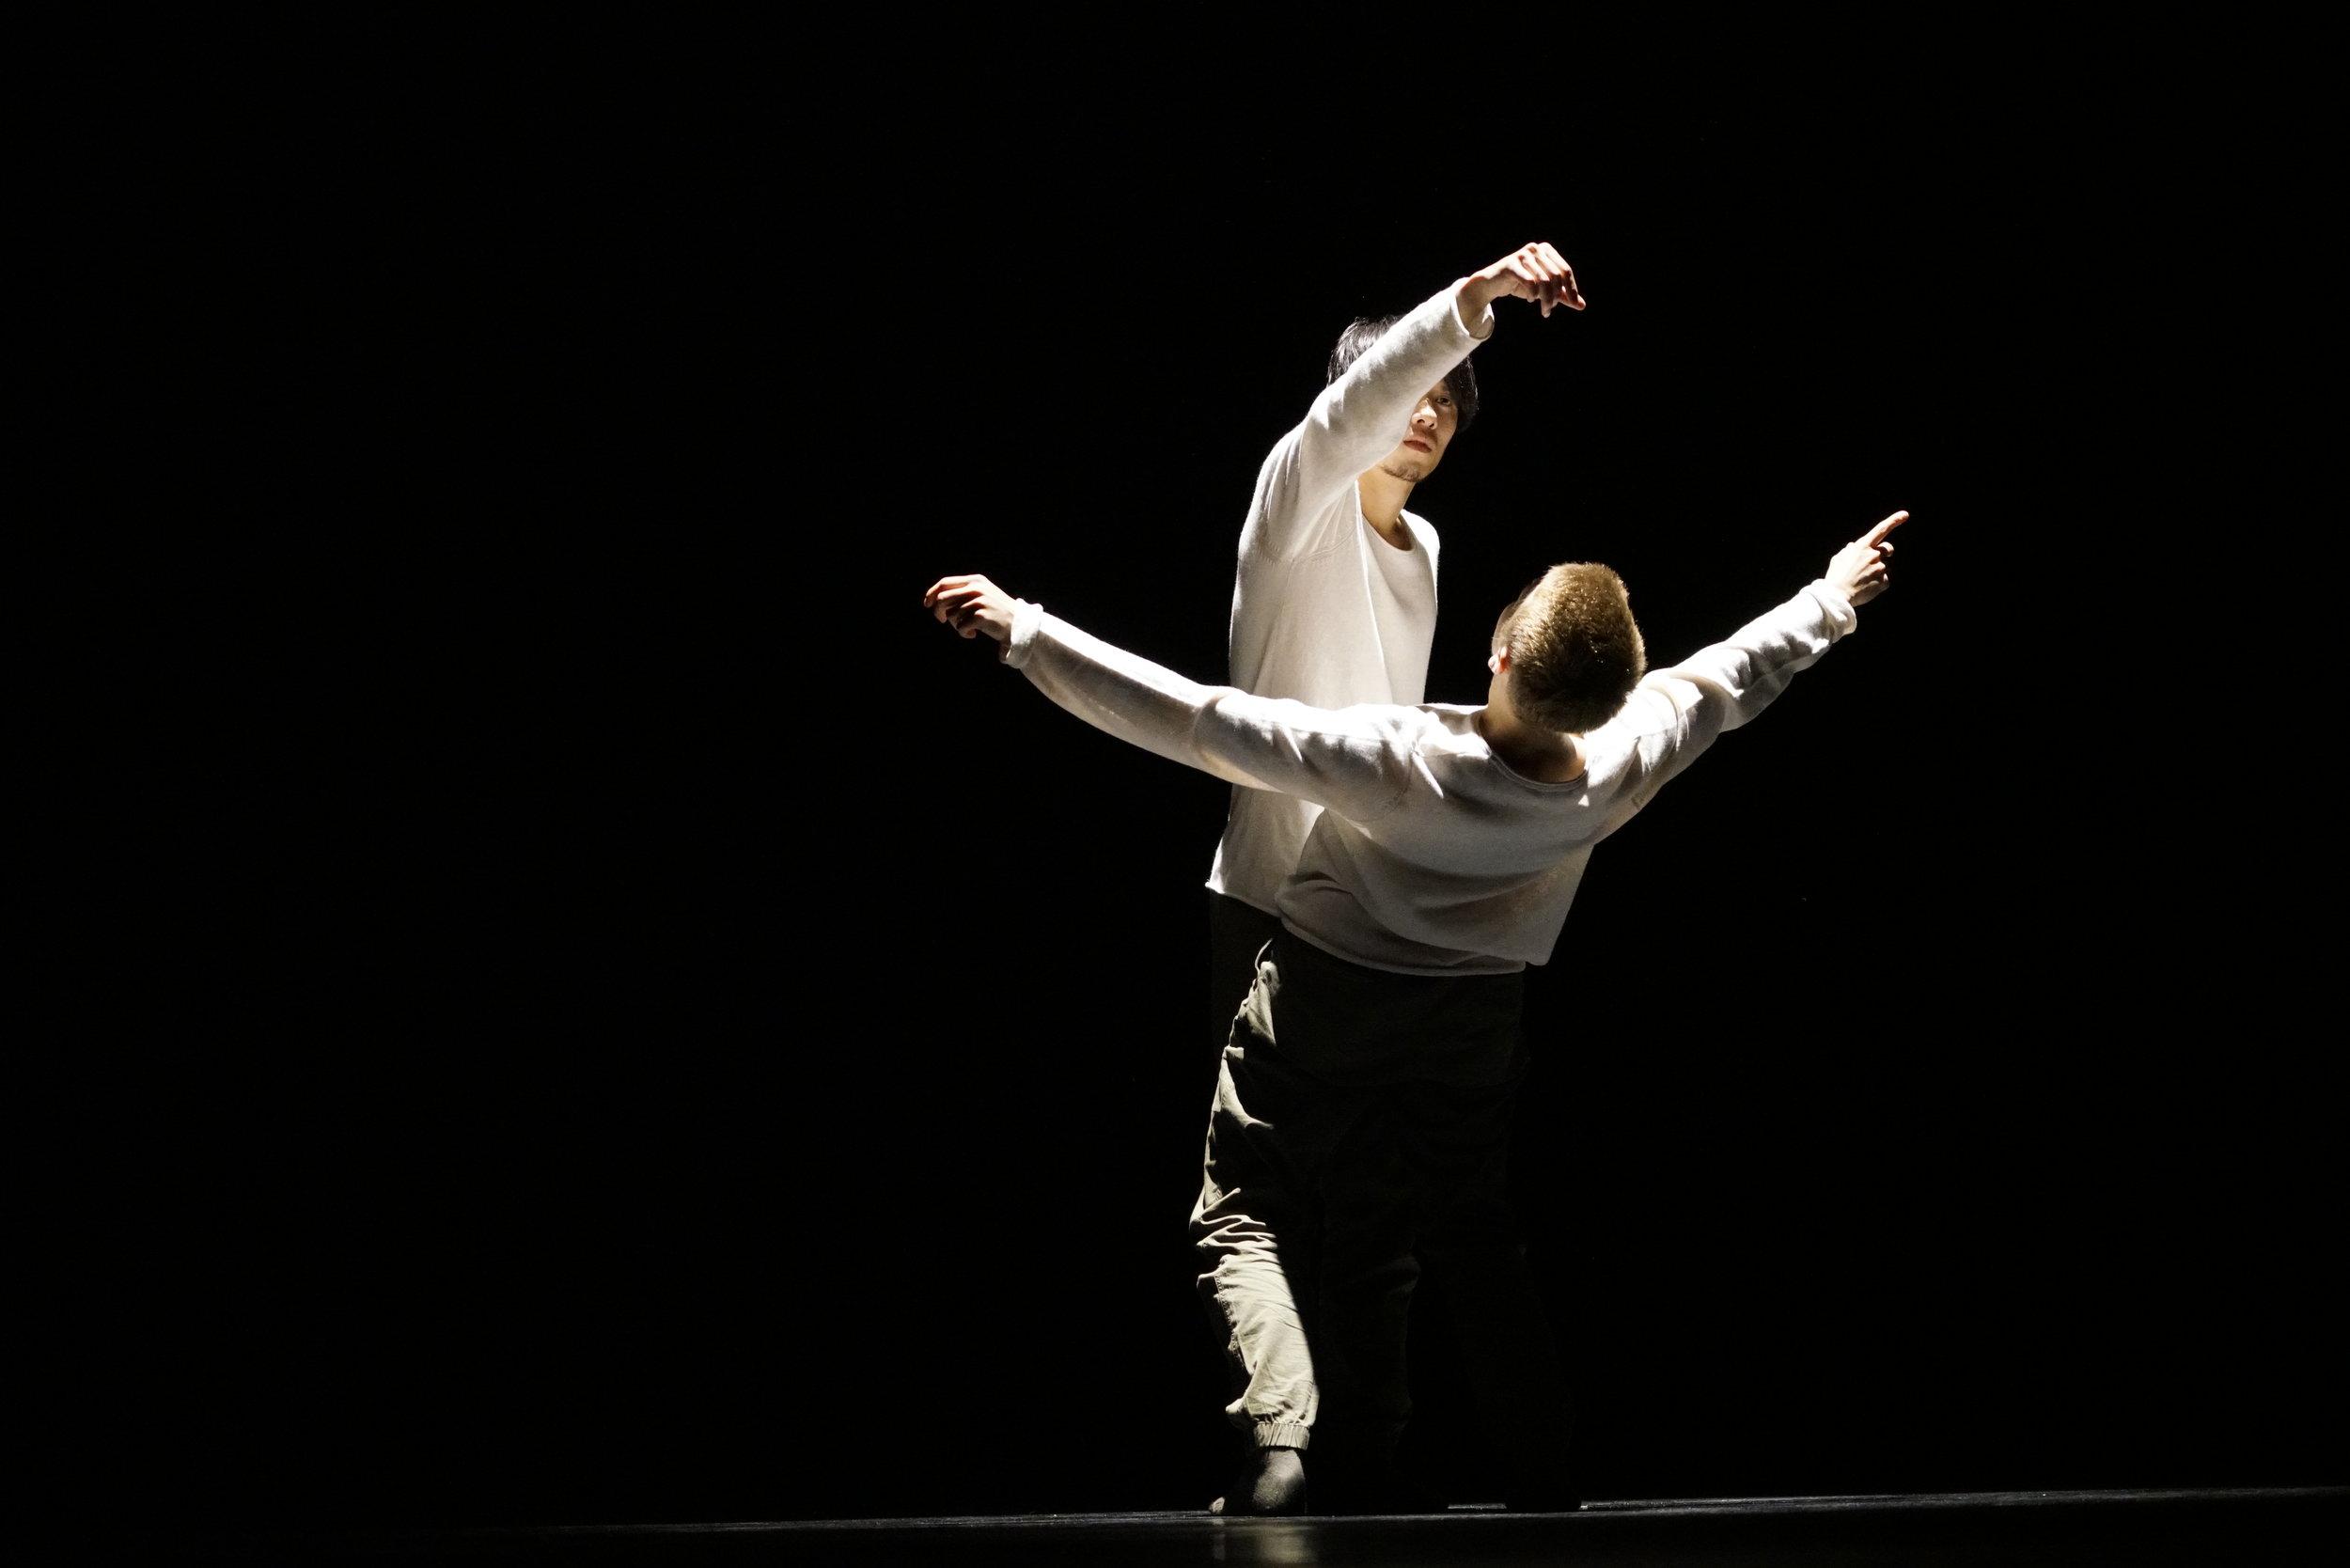 Residance Award DantzaZ Dance Company - Before you say it. Sade Mamedova.JPG